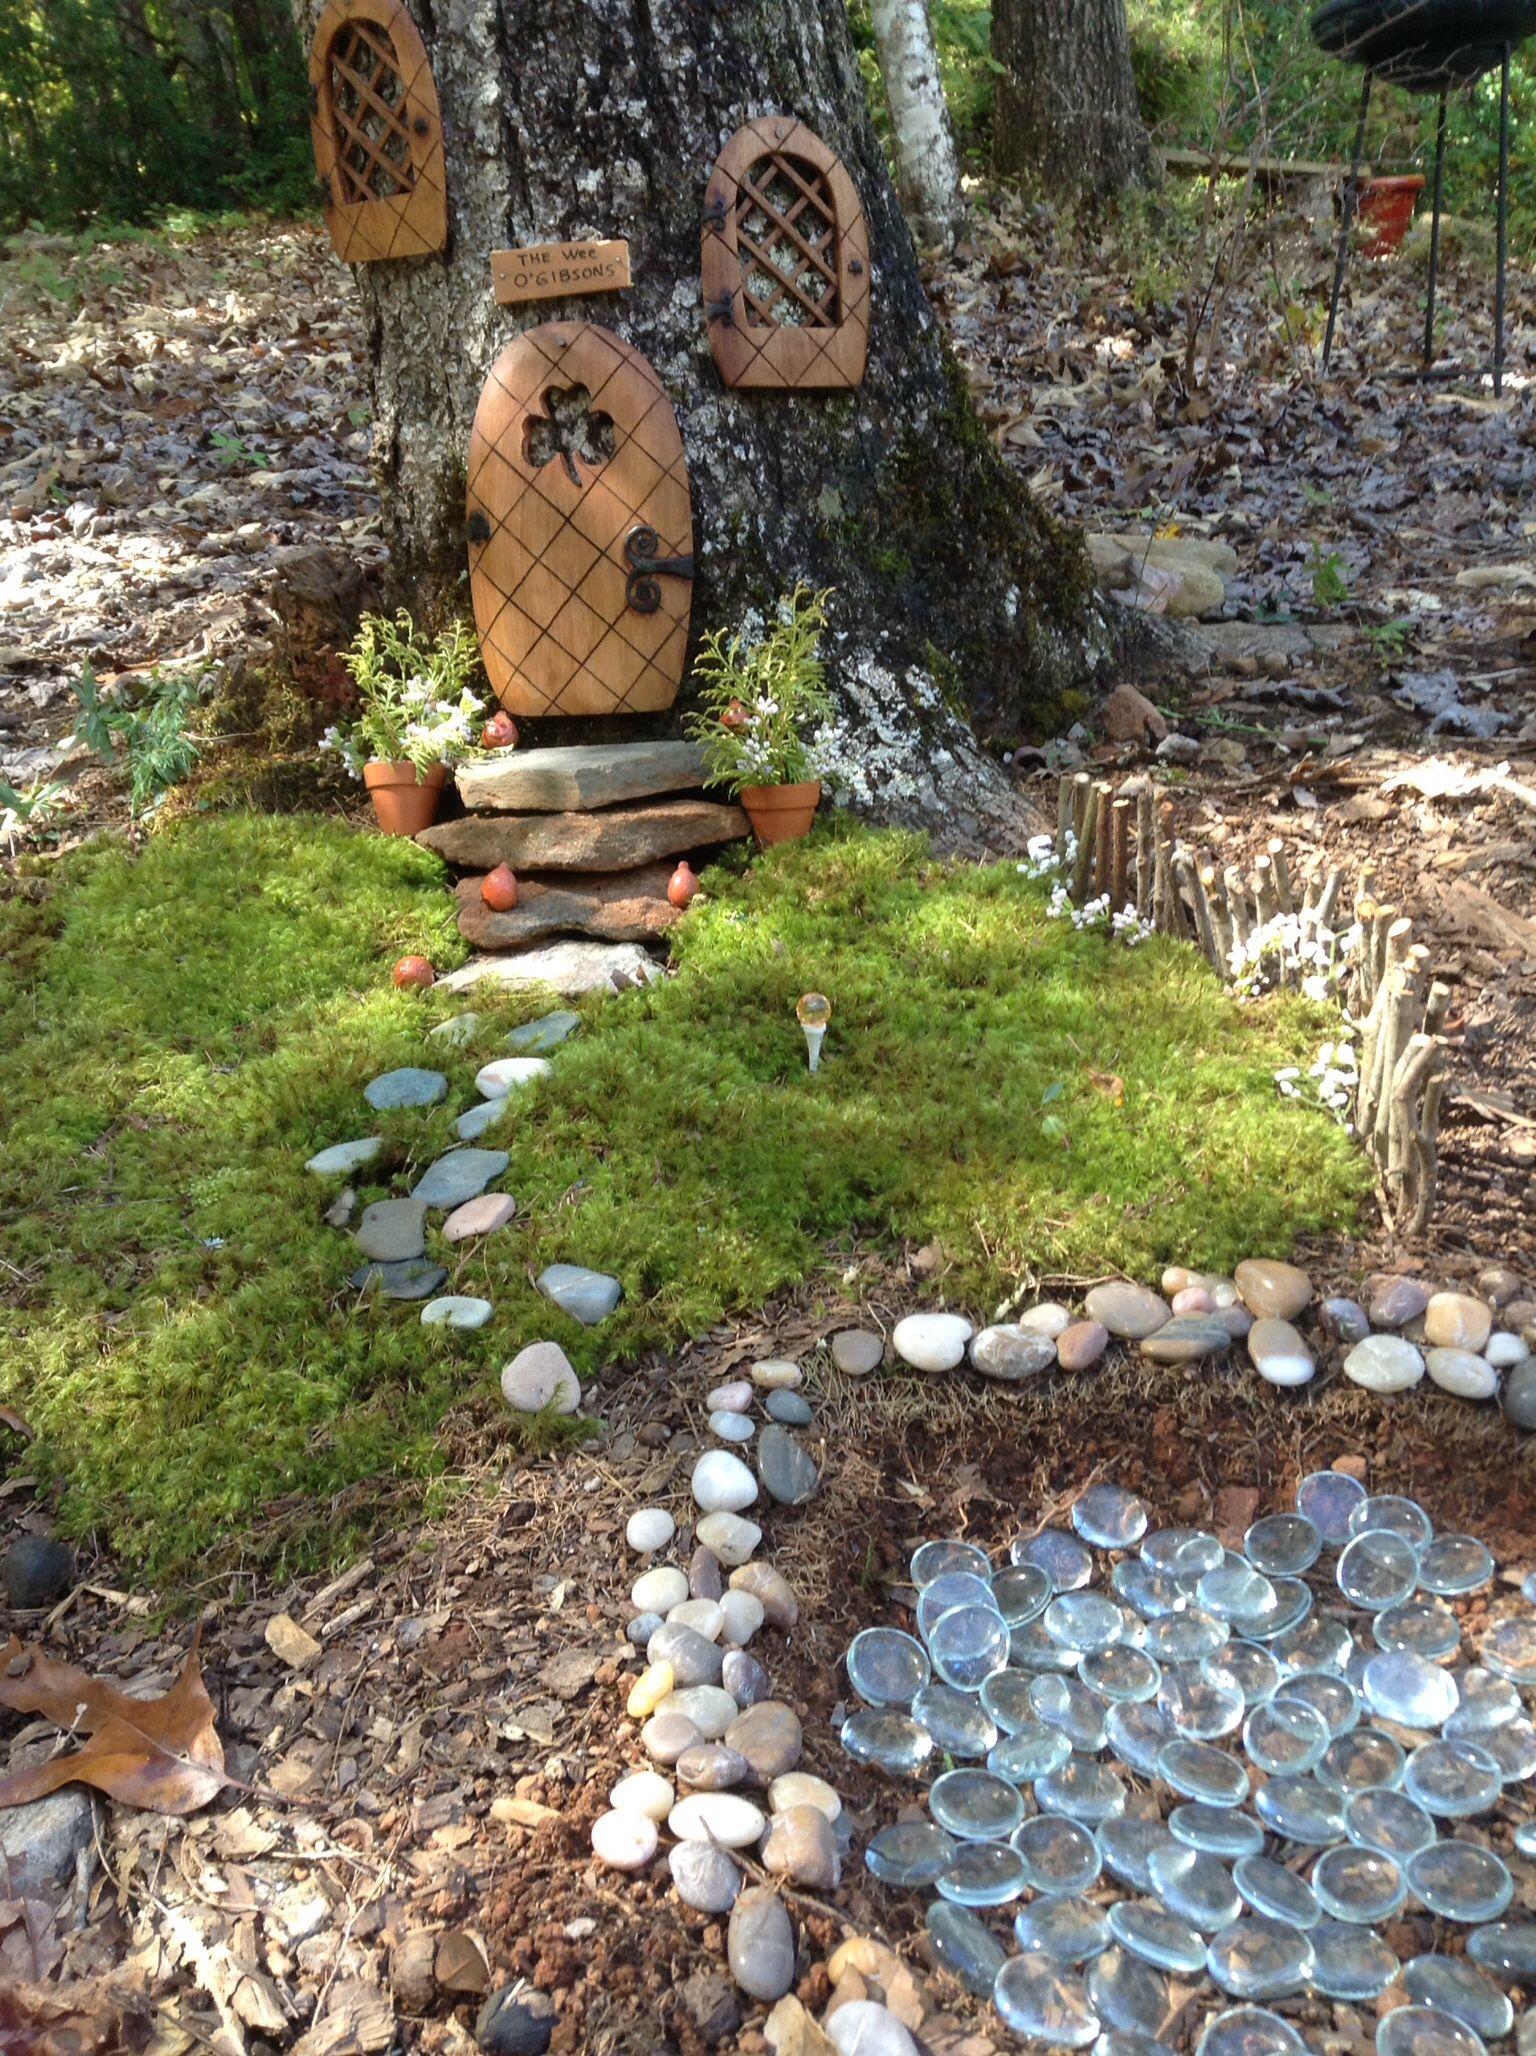 Leprechaun house and garden. | Yard decor and ornaments | Pinterest ...